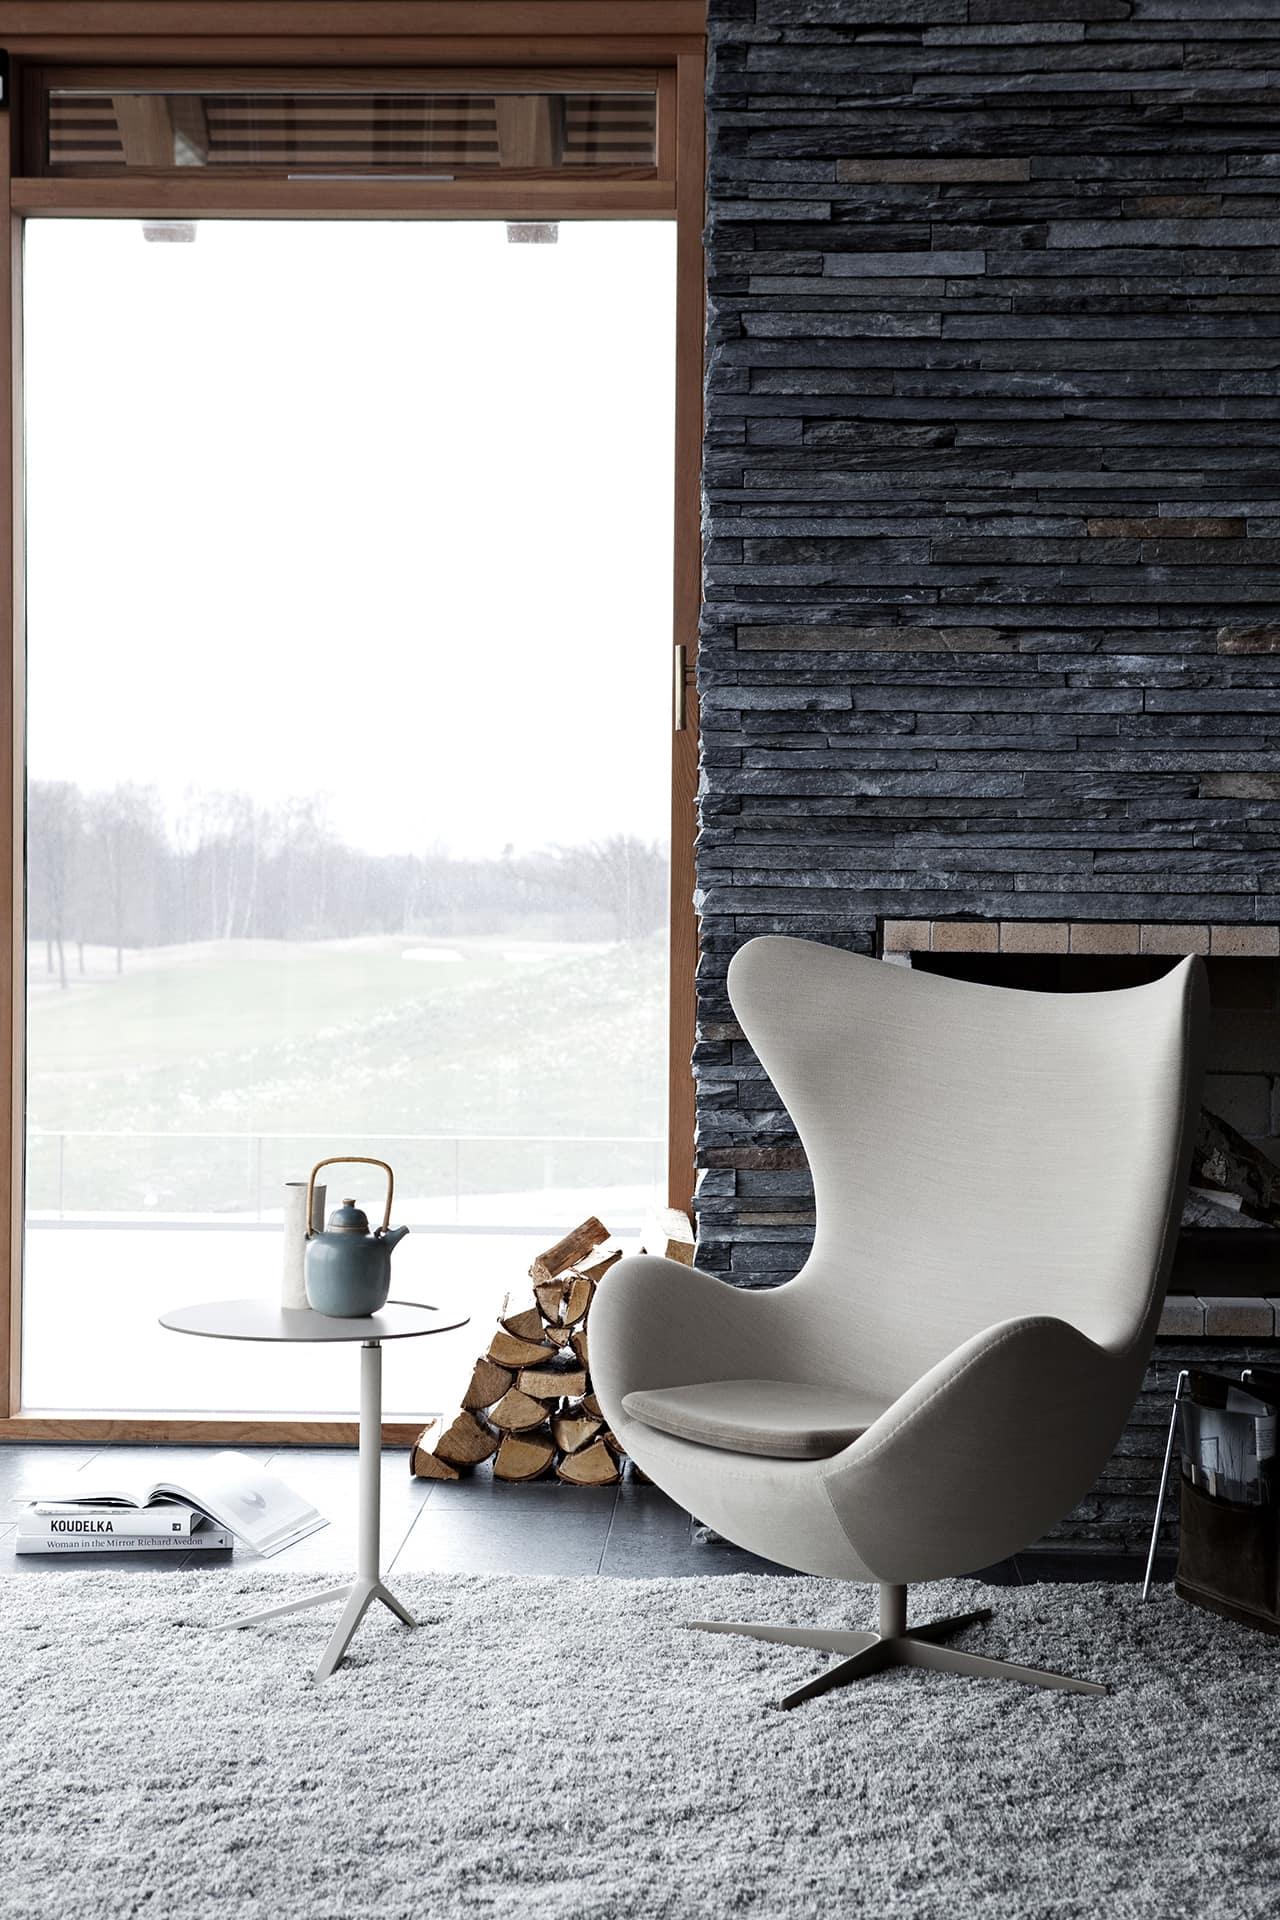 fauteuil oeuf Arm jacobsen design